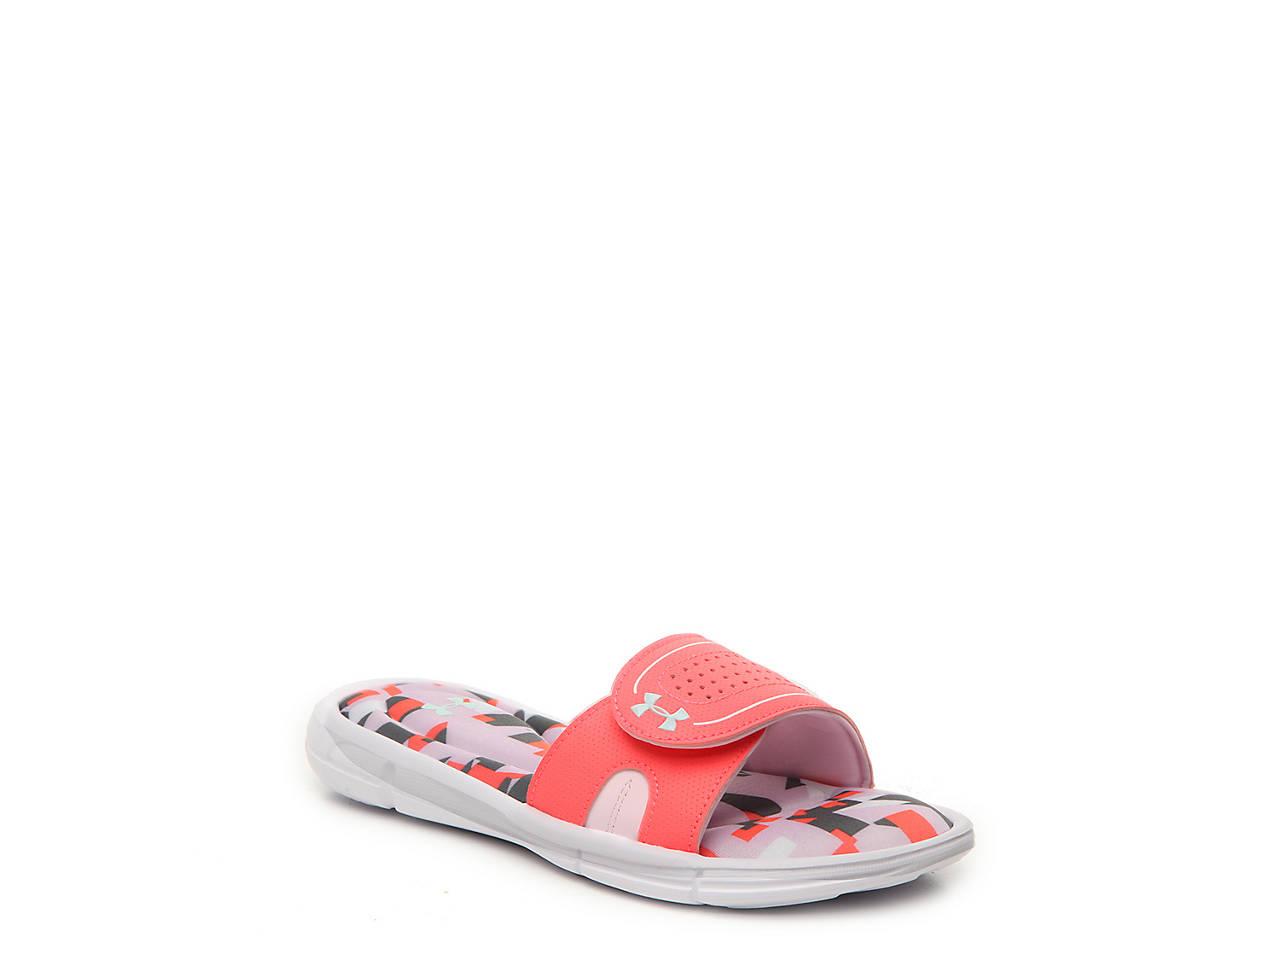 cb5eb169ea1ac Under Armour Ignite Jagger VIII Youth Slide Sandal Kids Shoes